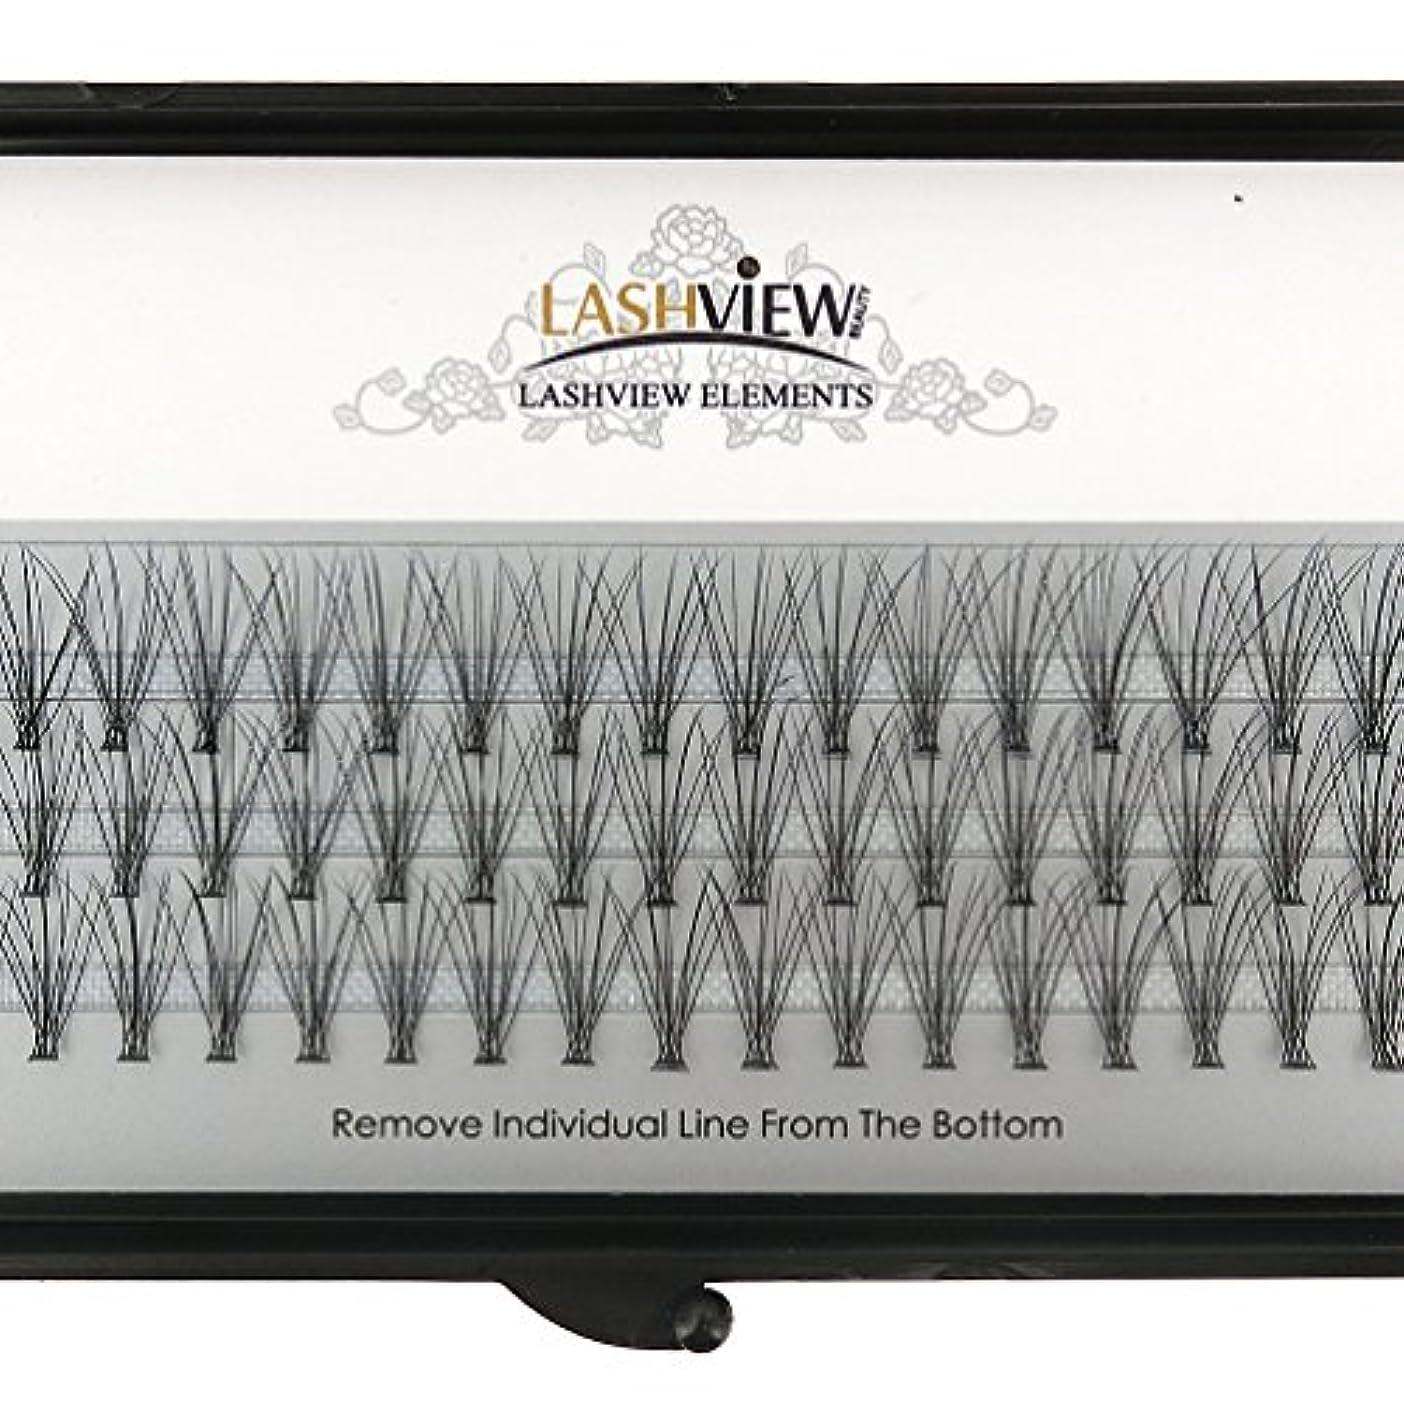 LASHVIEW 高品質まつげエクステフレア セルフ用 超極細素材 太さ0.07mm 12mm Cカール マツエク10本束